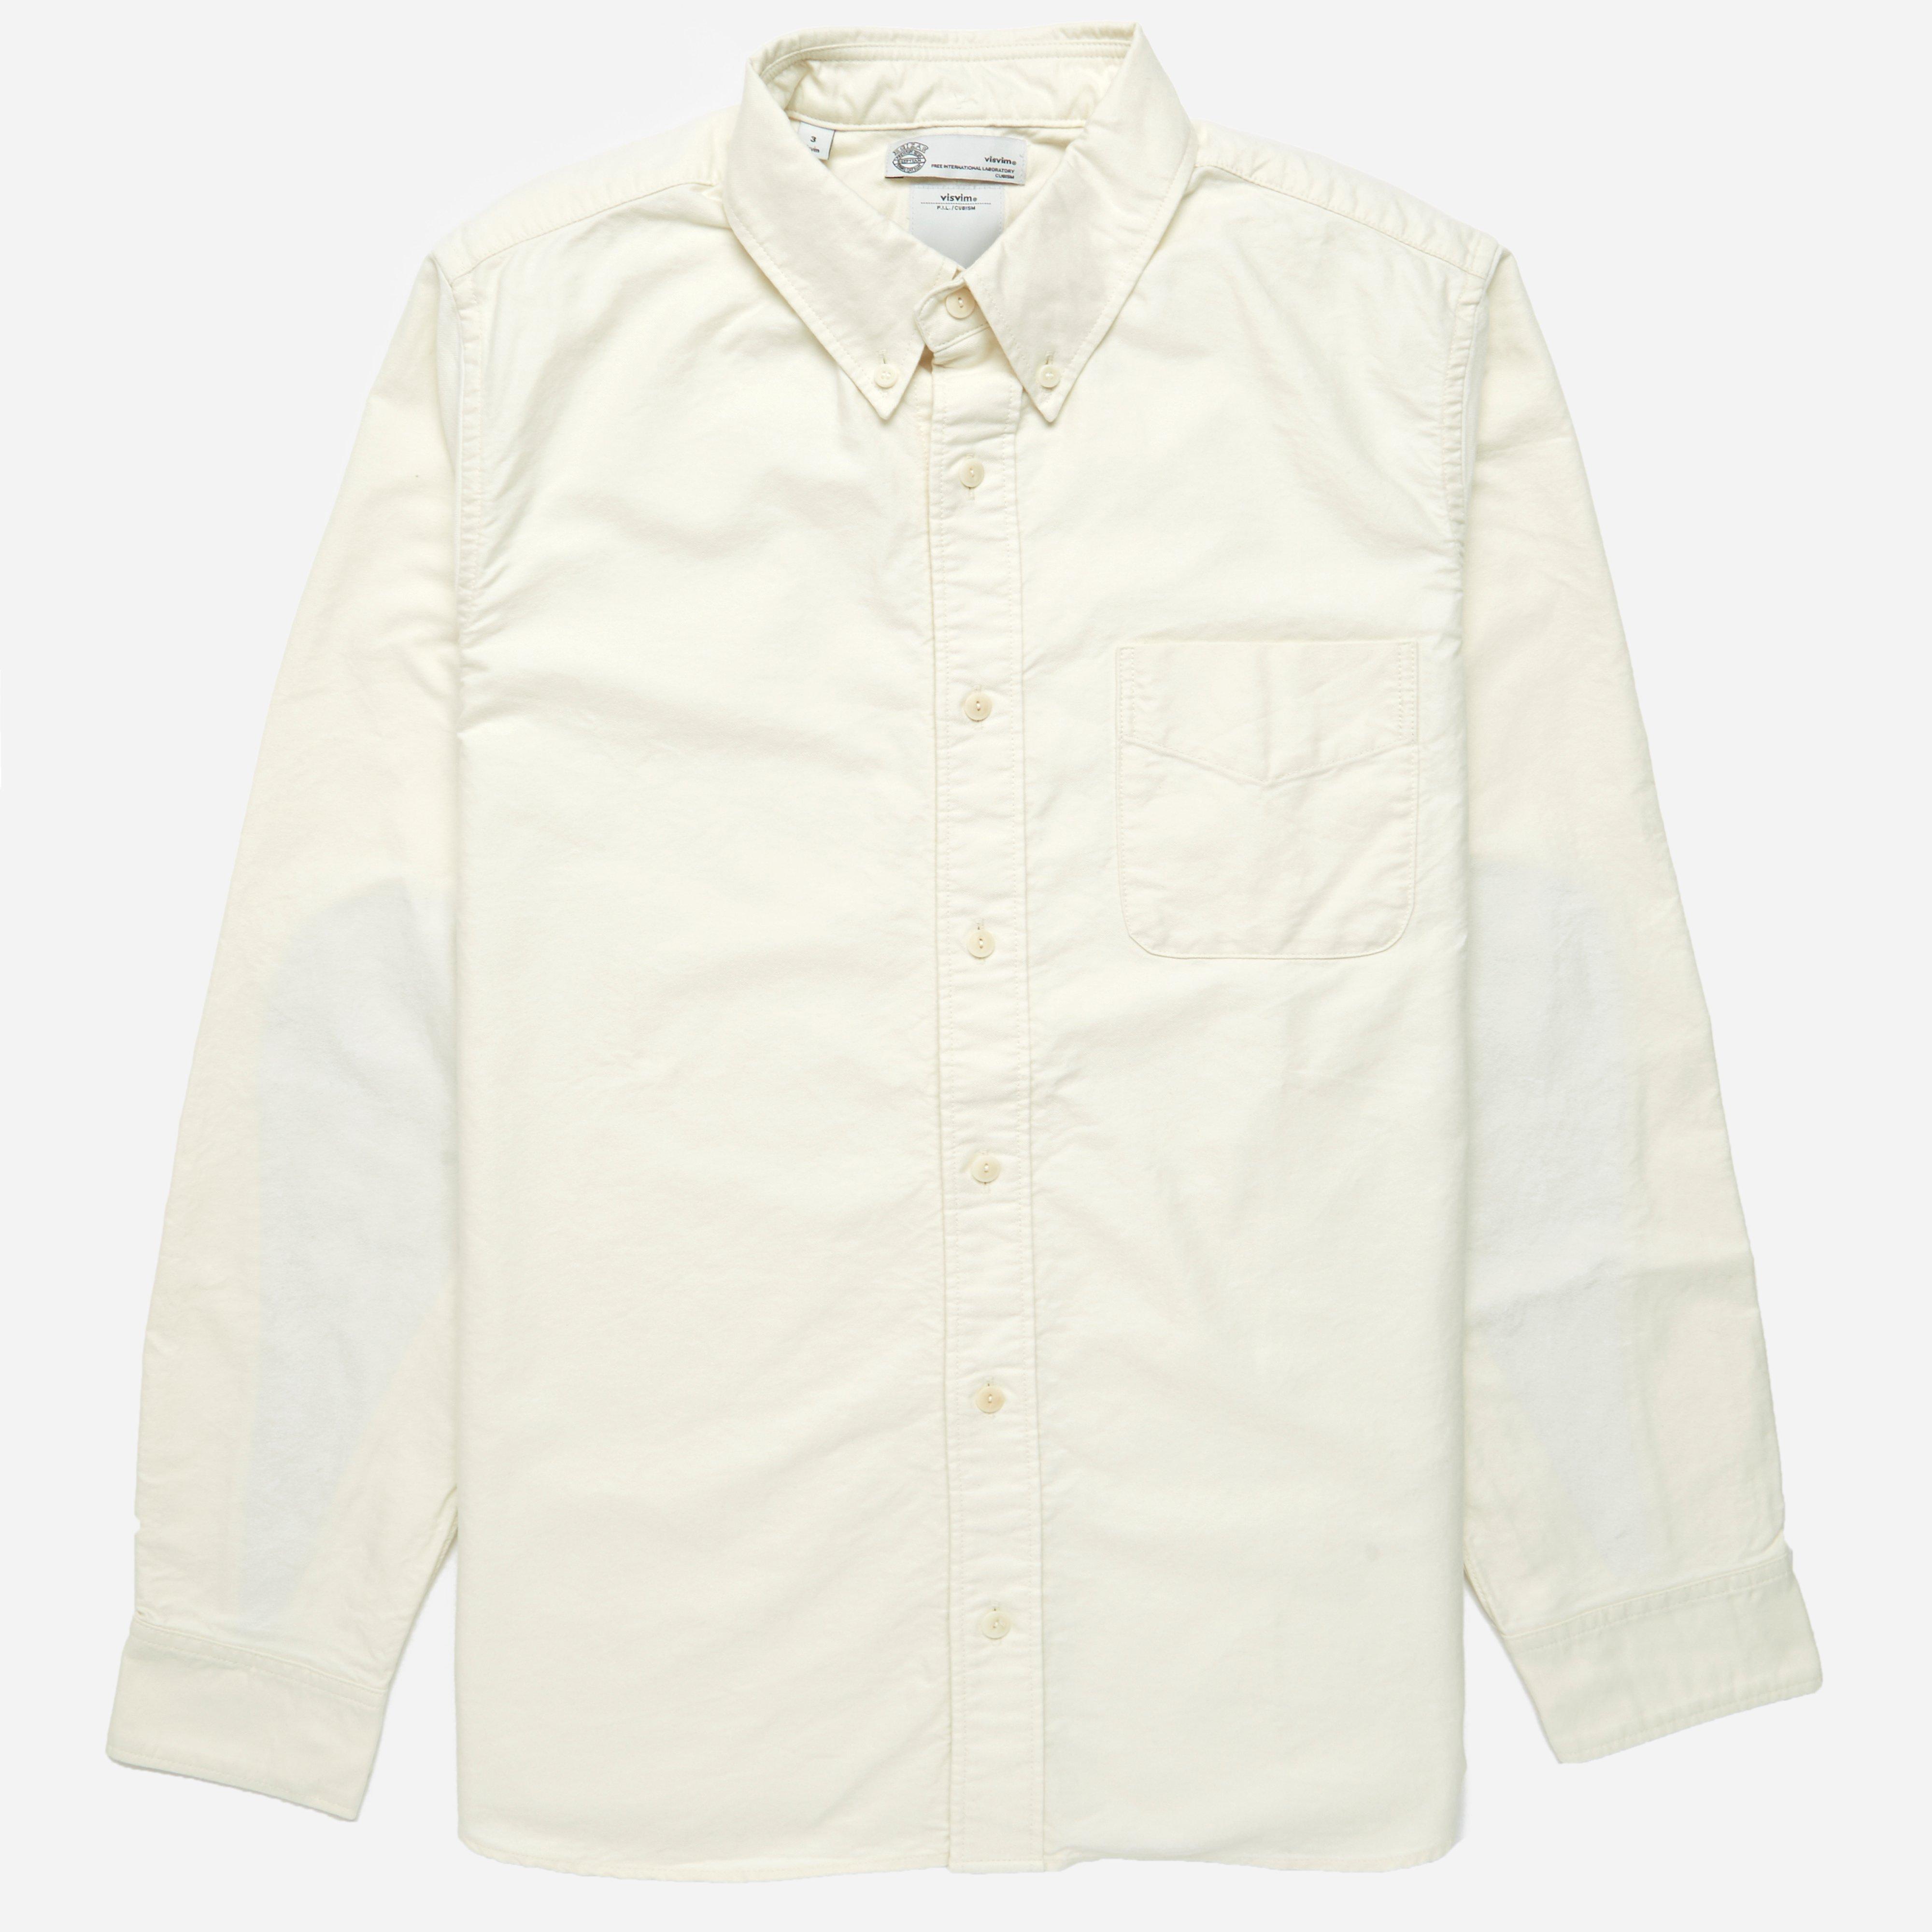 Visvim Albacore Blanket Shirt